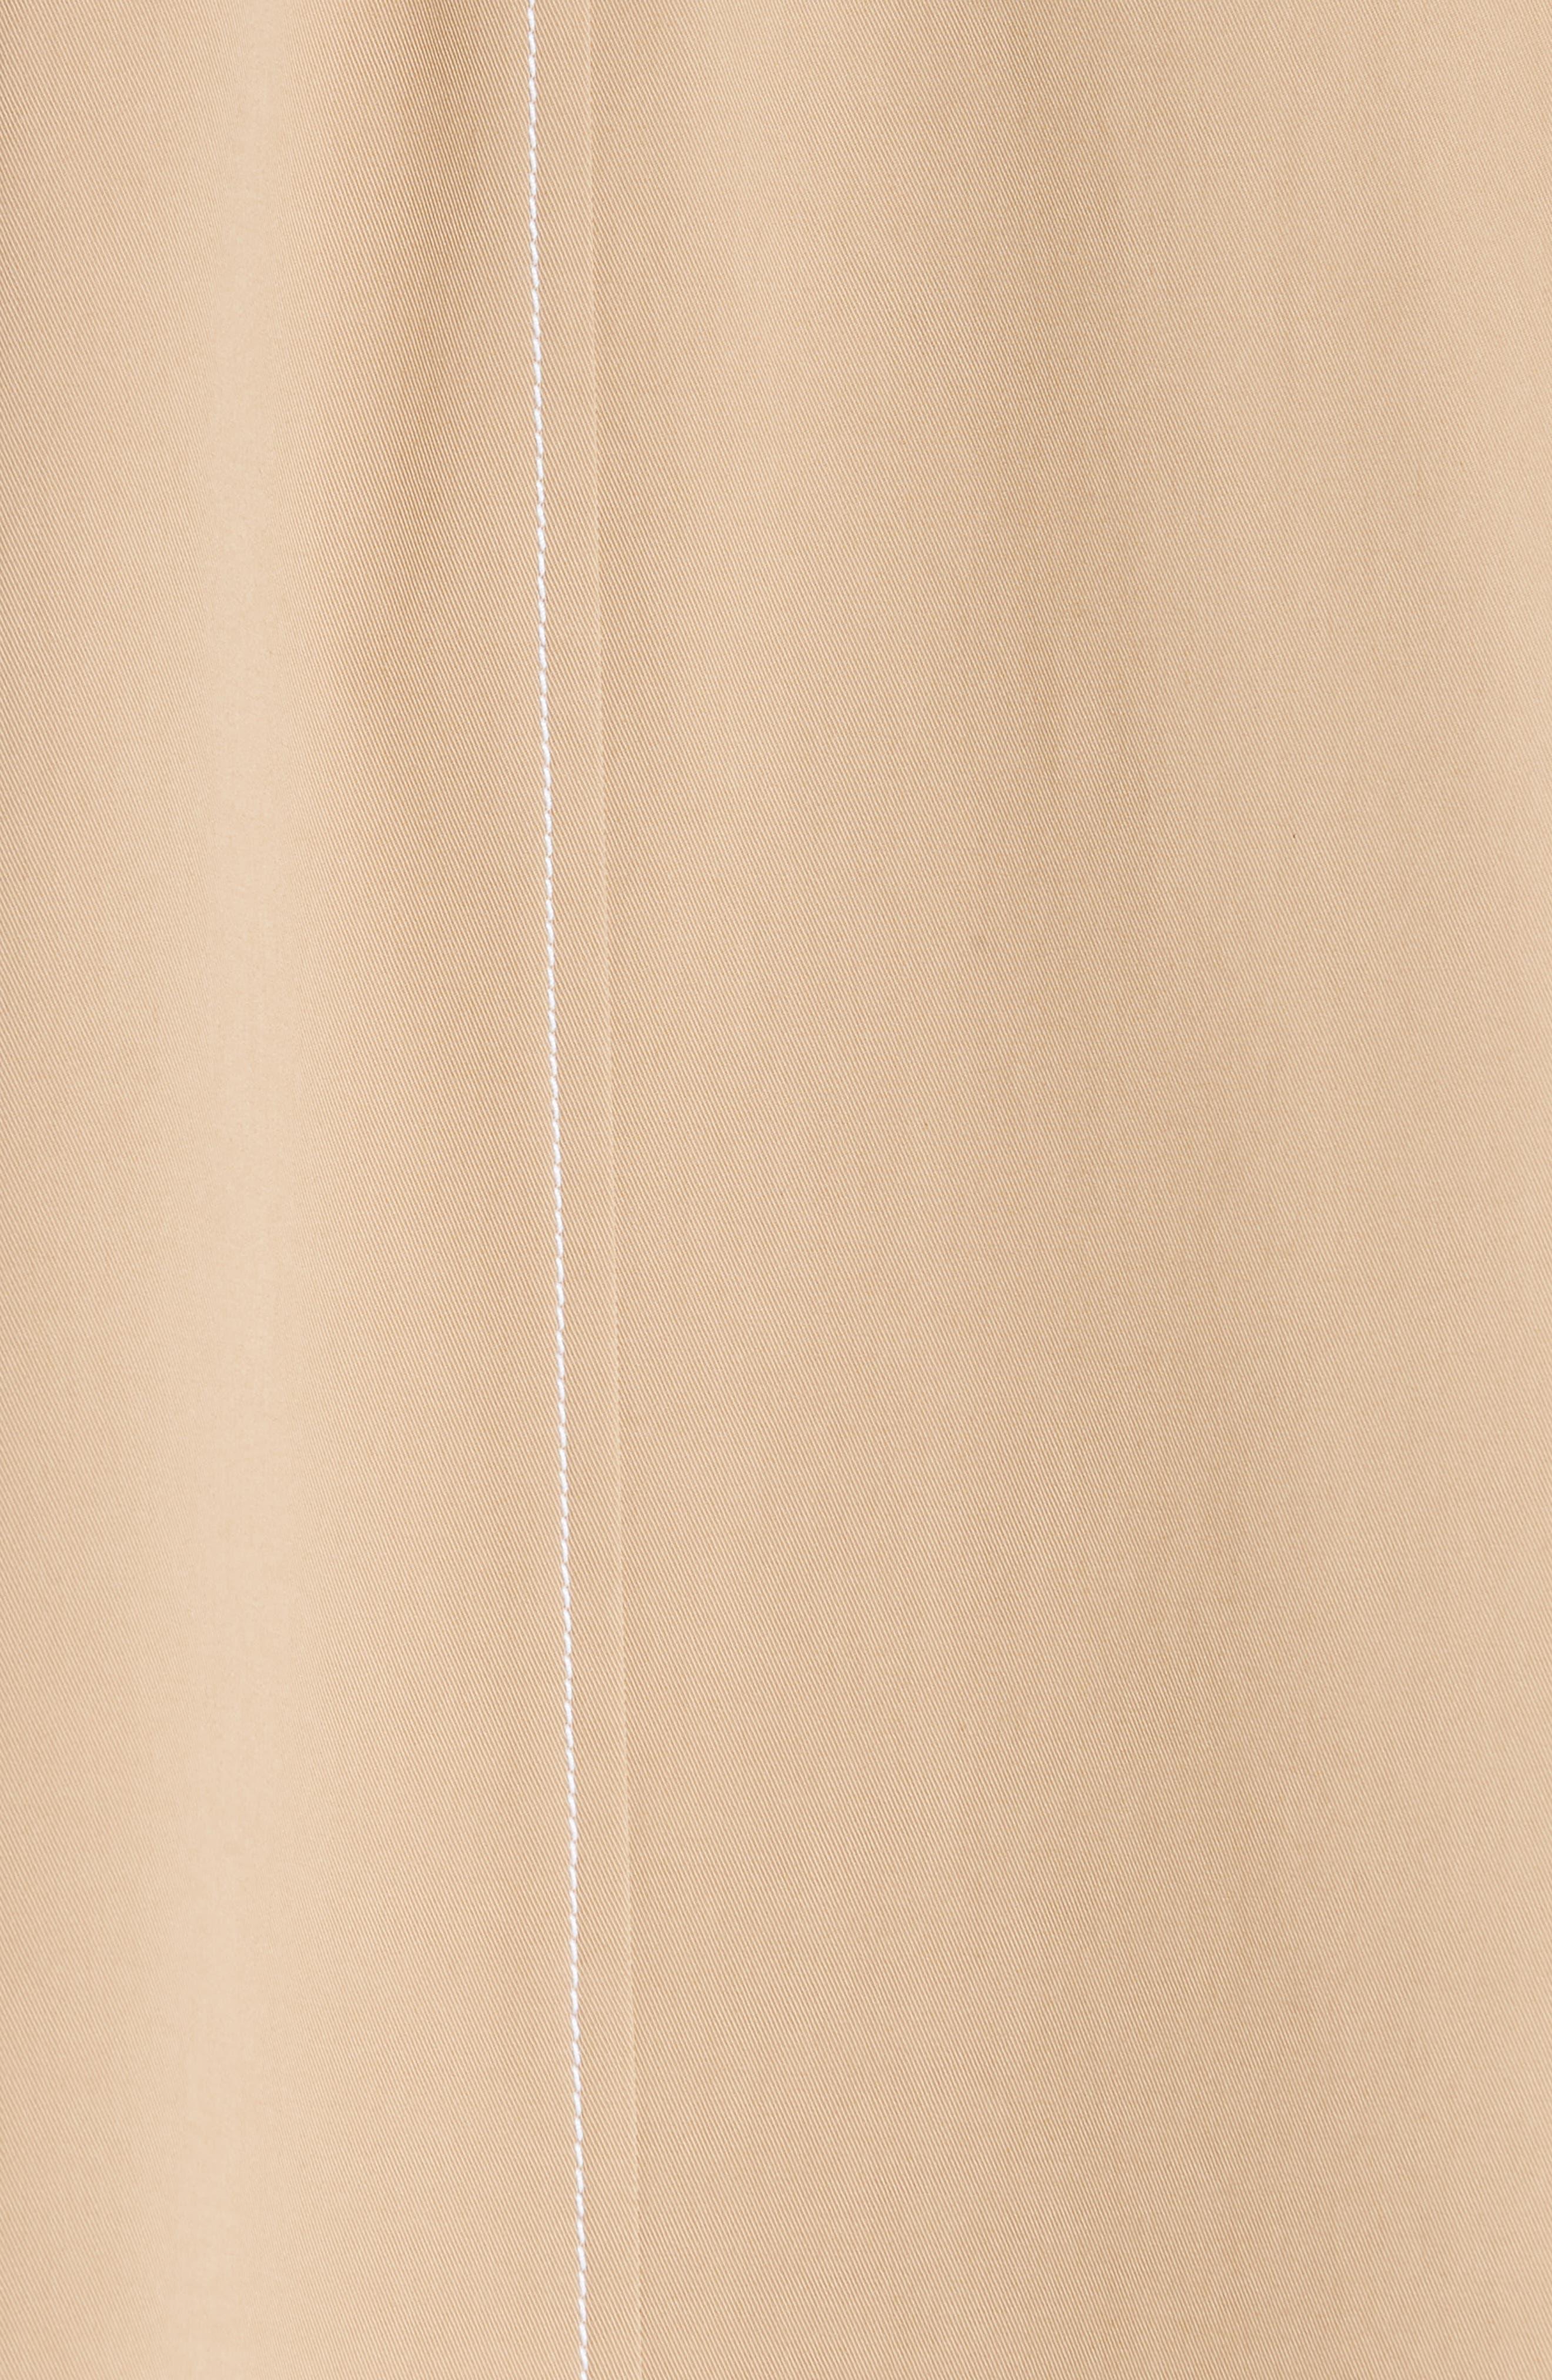 Asher Gabardine Crop Trench Coat,                             Alternate thumbnail 7, color,                             BIRCH